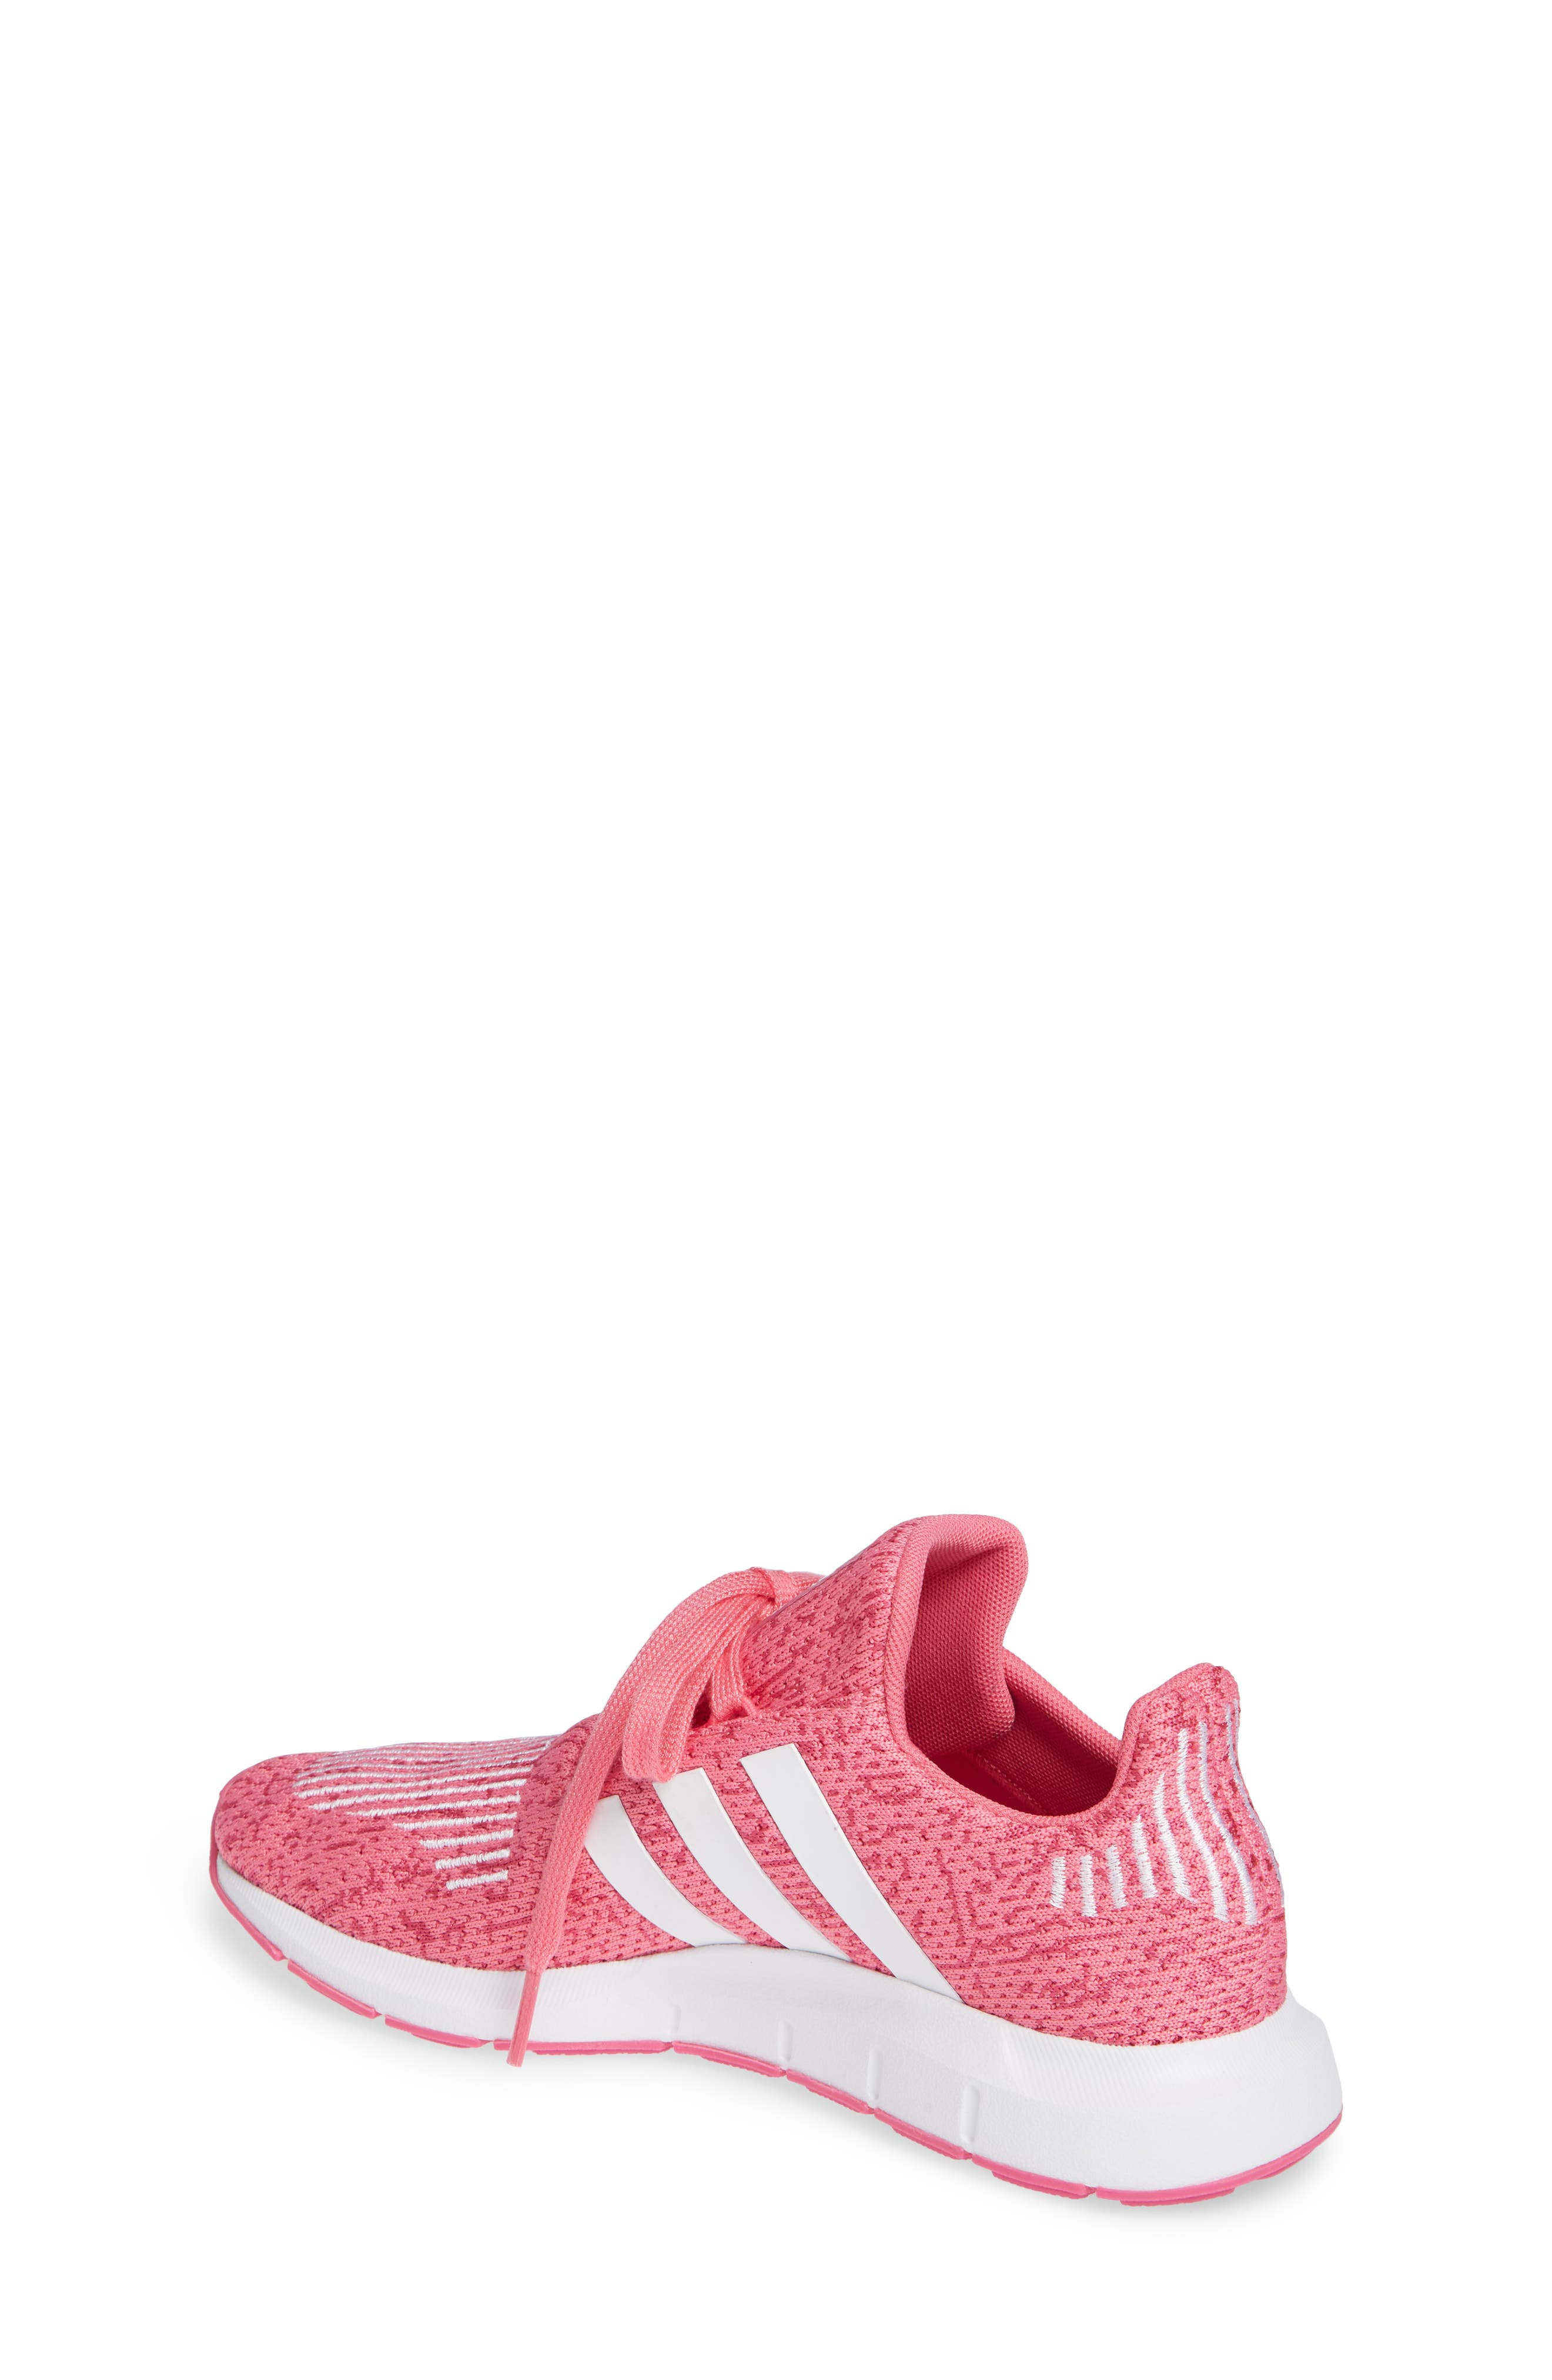 Swift Run J Sneaker,                             Alternate thumbnail 2, color,                             SEMI SOLAR PINK/ WHITE